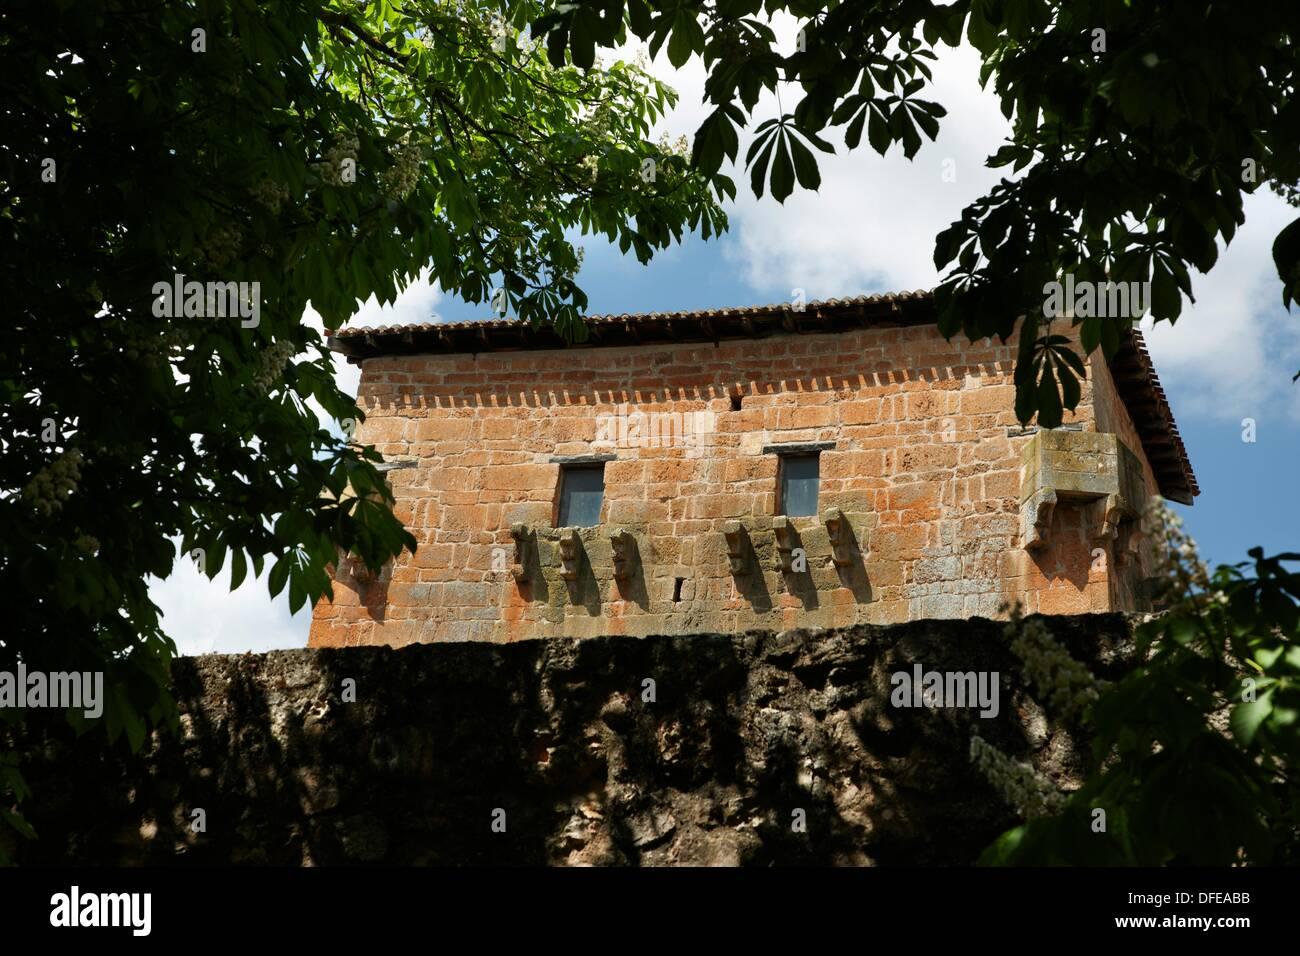 Tower of Fernan Gonzalez, Covarrubias, Burgos province, Castilla-Leon, Spain - Stock Image